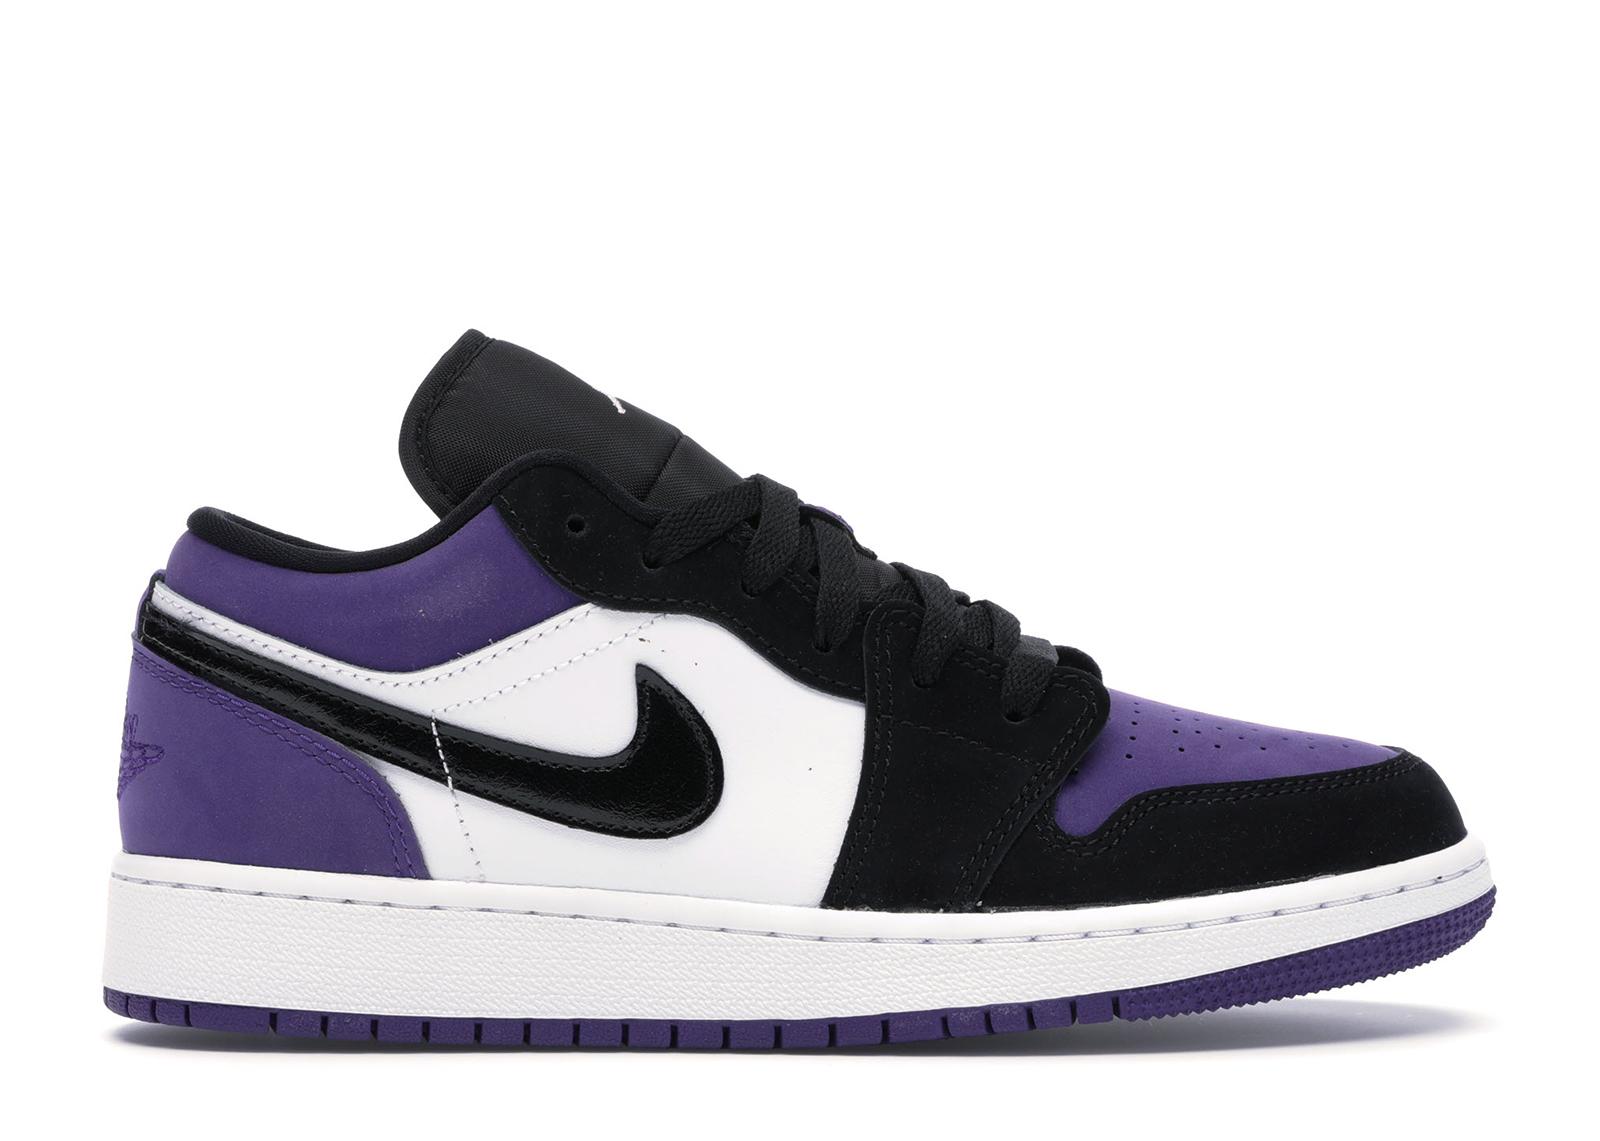 Air Jordan 1 Low Court Purple (GS)